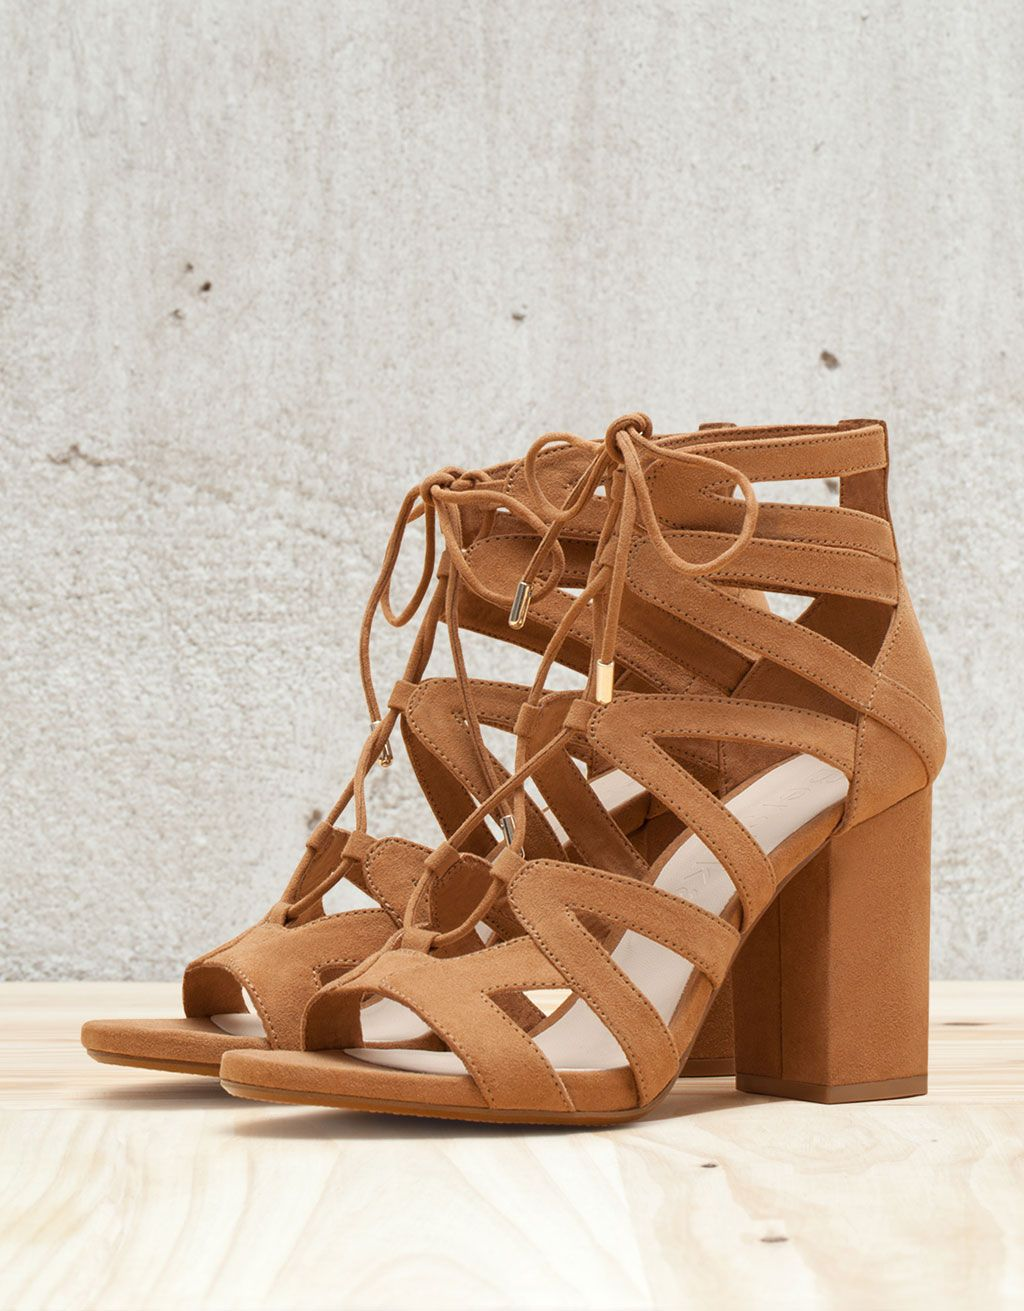 cd48d86481f2a0 Sandales à talons avec cordon - Voir Tout - Bershka France Chaussure Talon  Femme, Chaussure